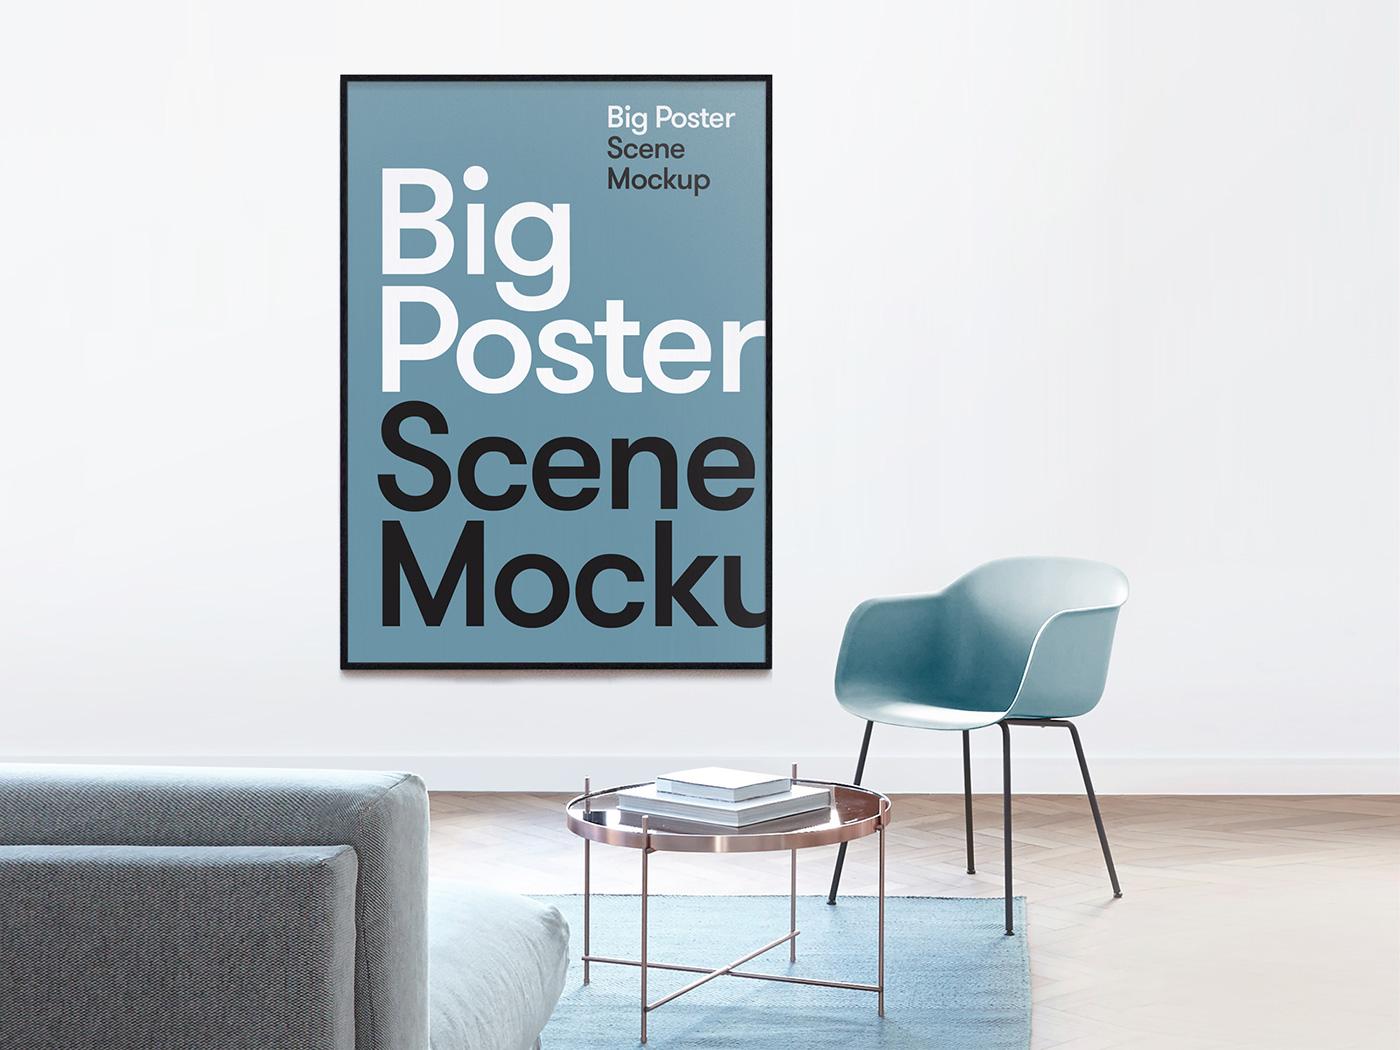 Big Poster Scene Mockup